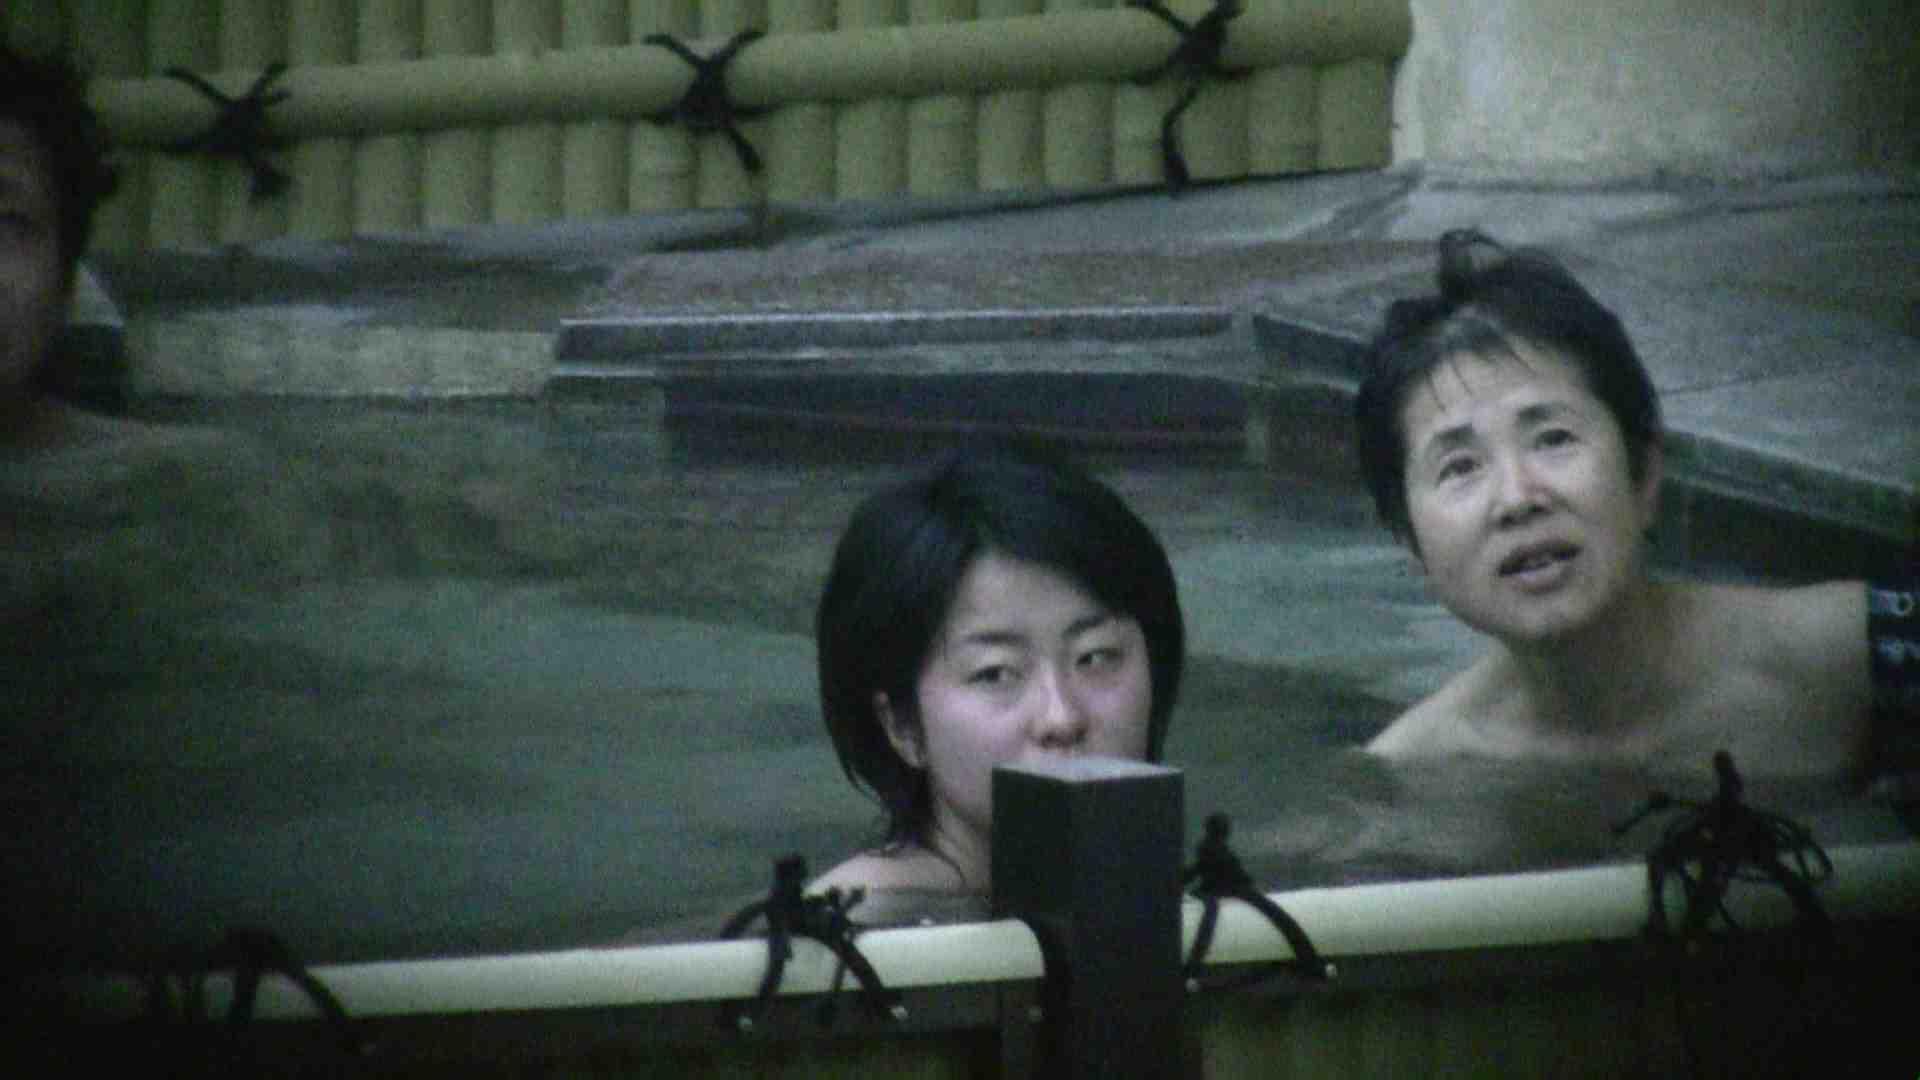 Aquaな露天風呂Vol.112 0 | 0  68連発 27